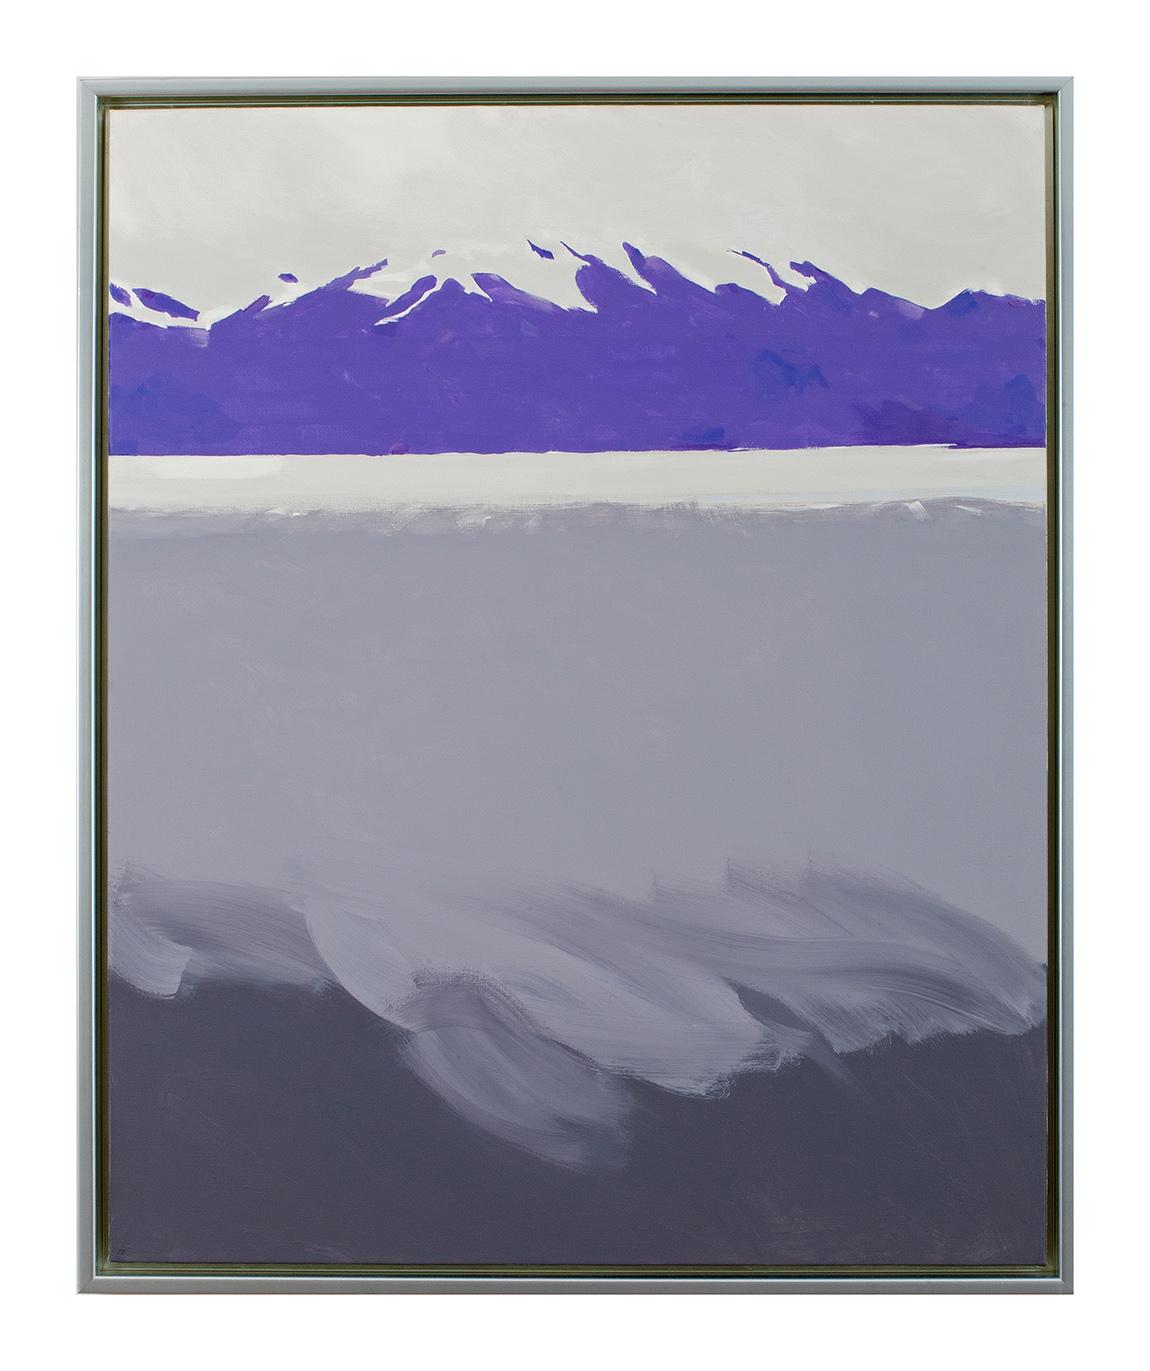 SOFT LANDING 2017 (f) 100x81 acrylic on canvas